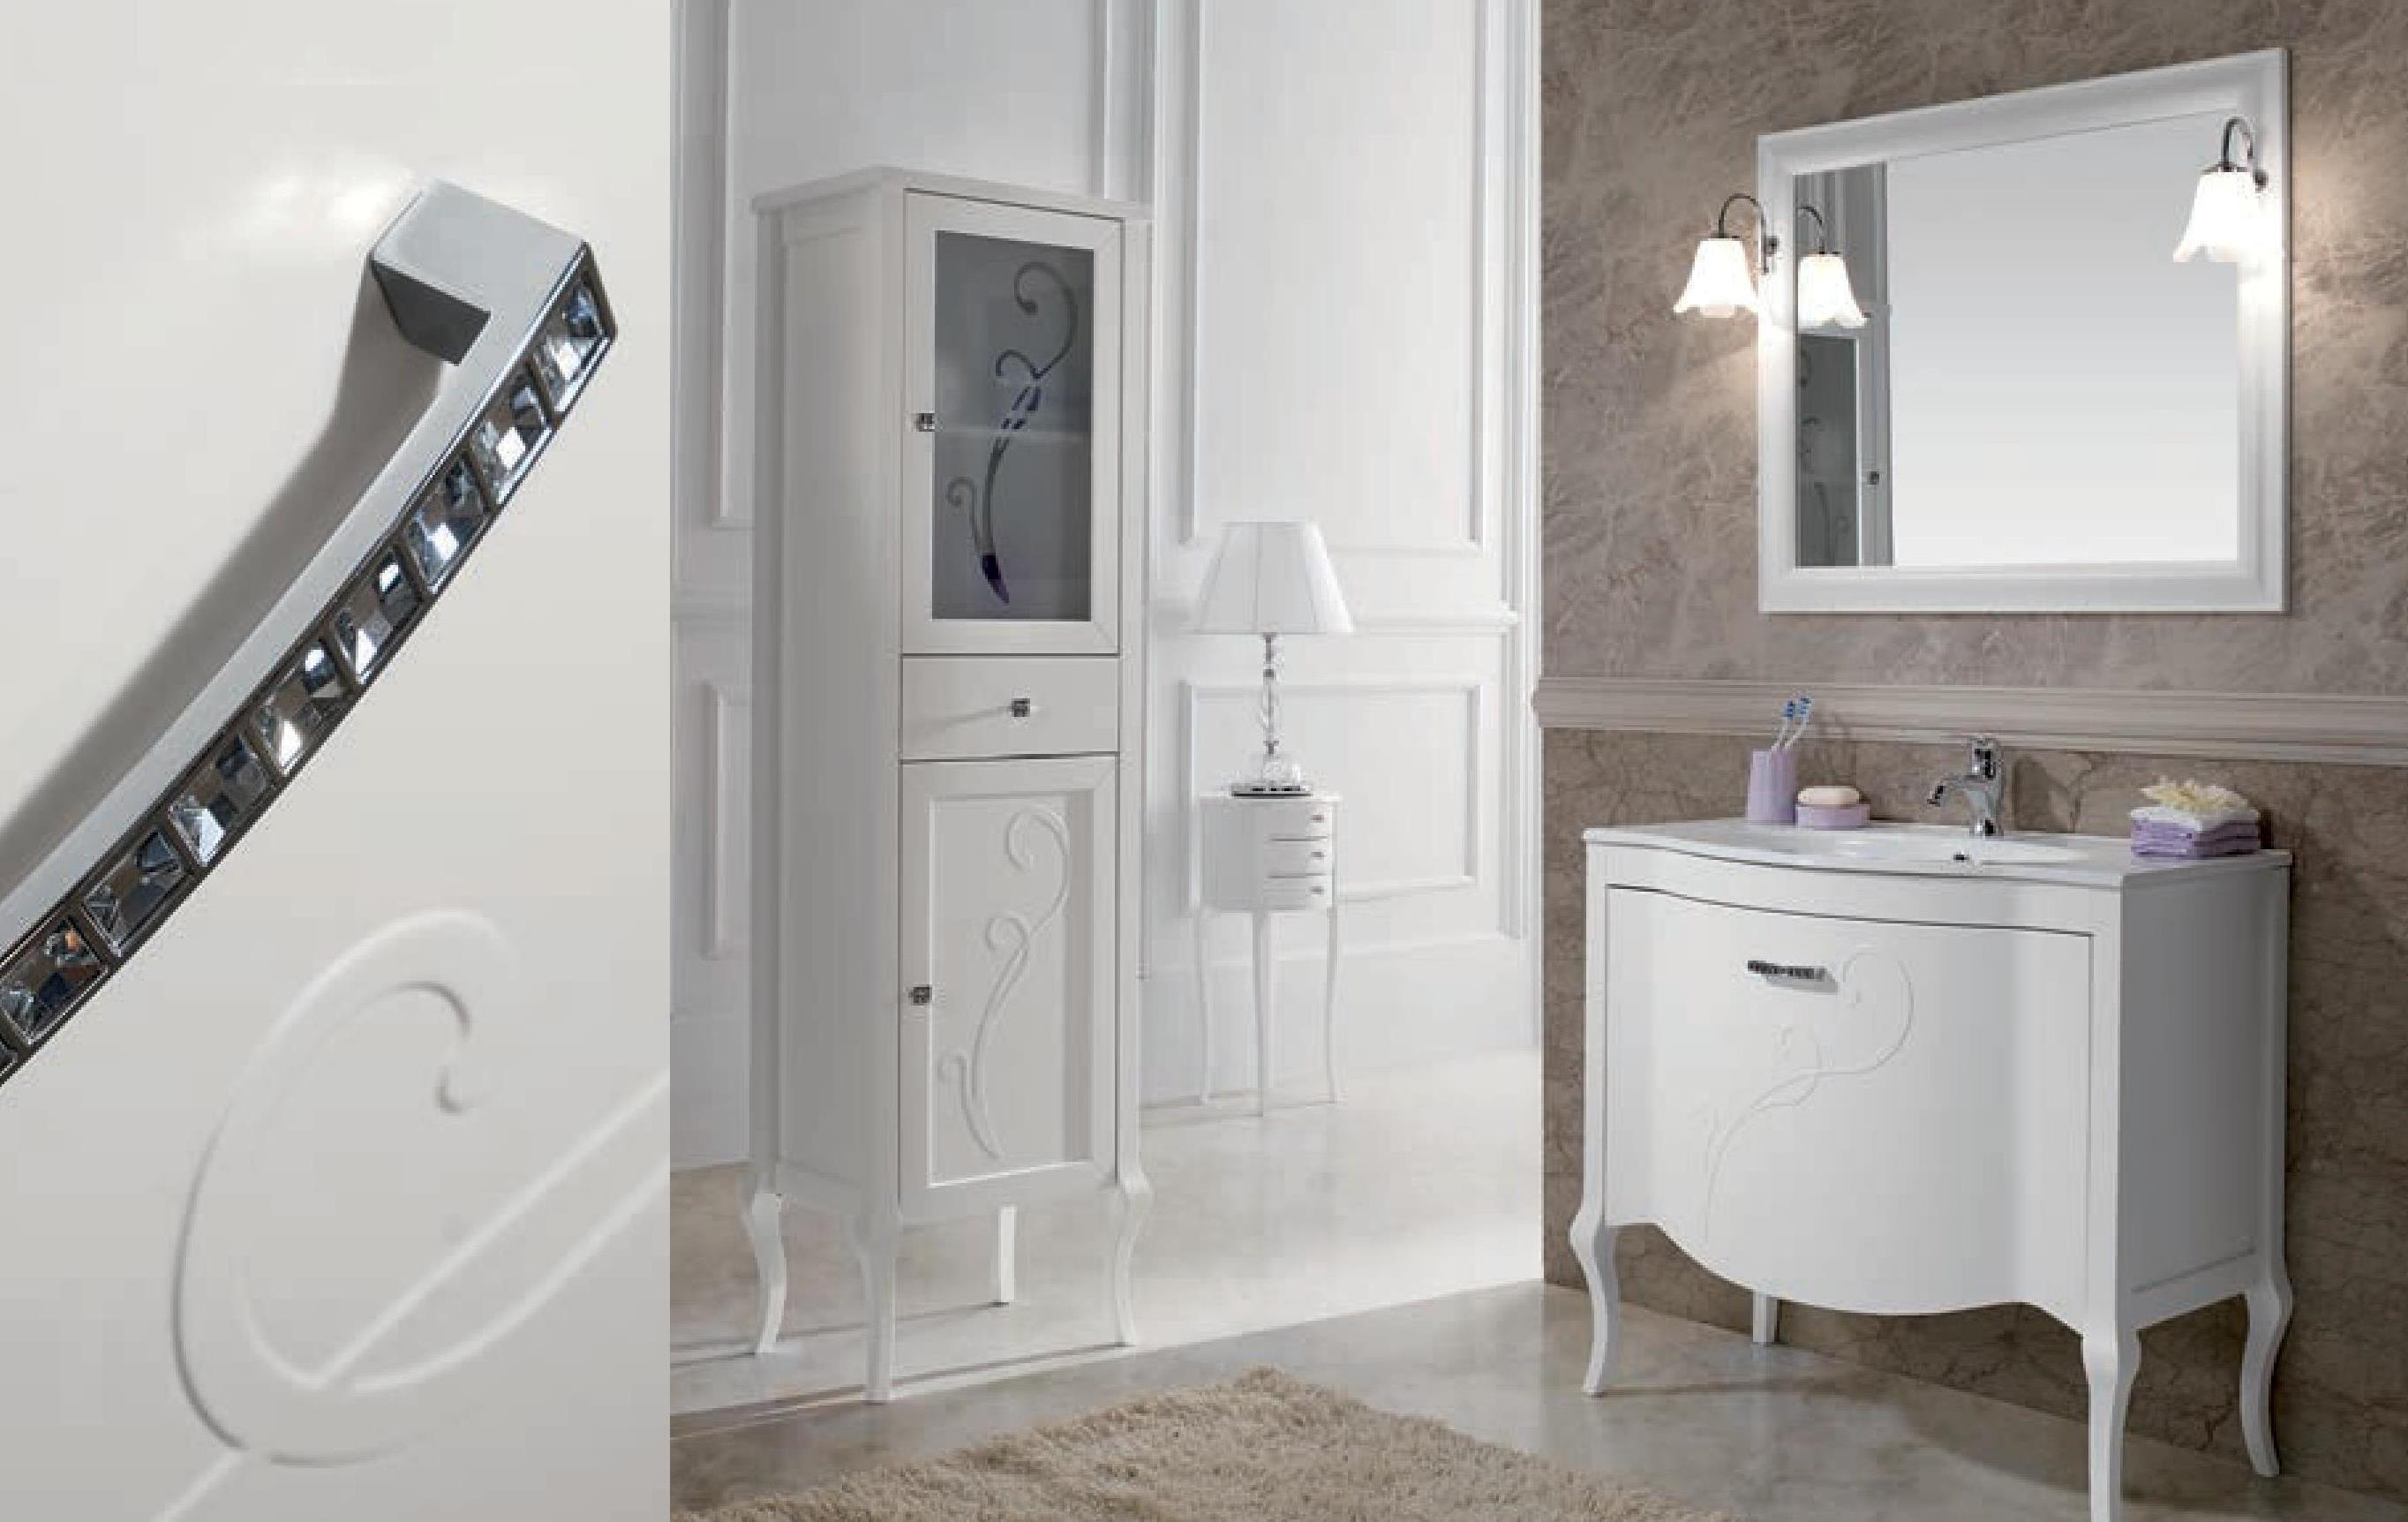 Bagni in muratura foto varie - Foto mobili bagno ...